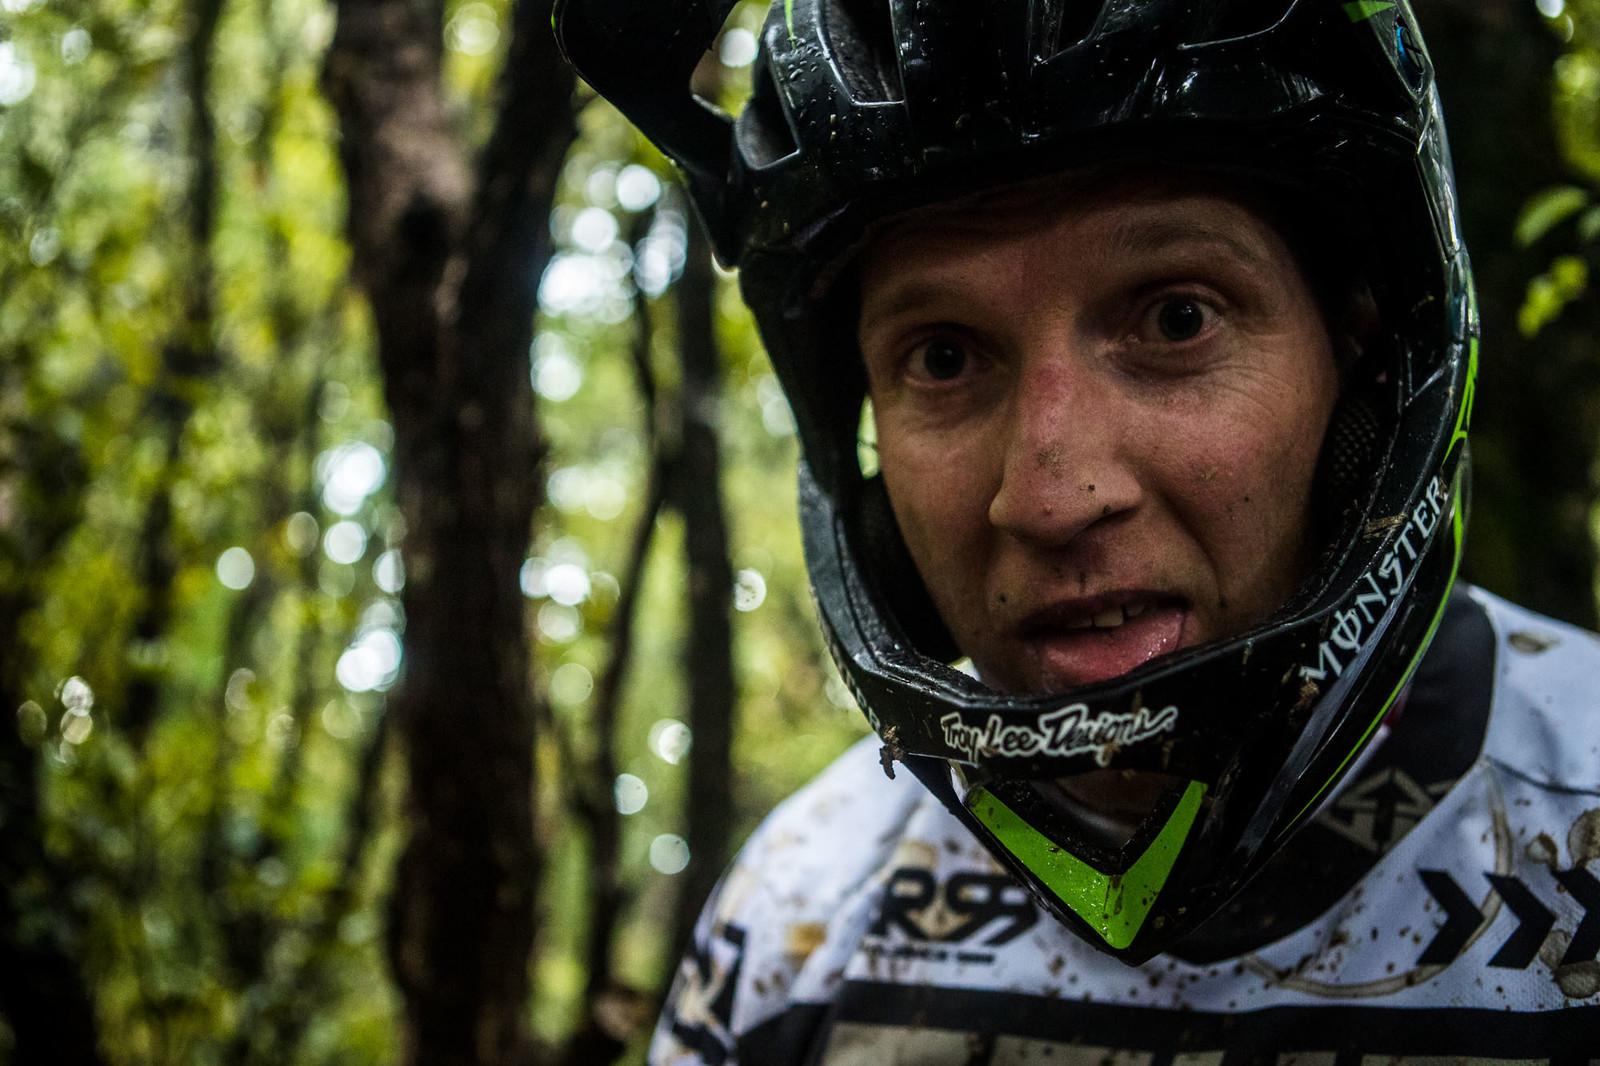 NZEnduro19 BB AS6I0280 - 2019 NZ Enduro Day 1 Photo Gallery - Mountain Biking Pictures - Vital MTB